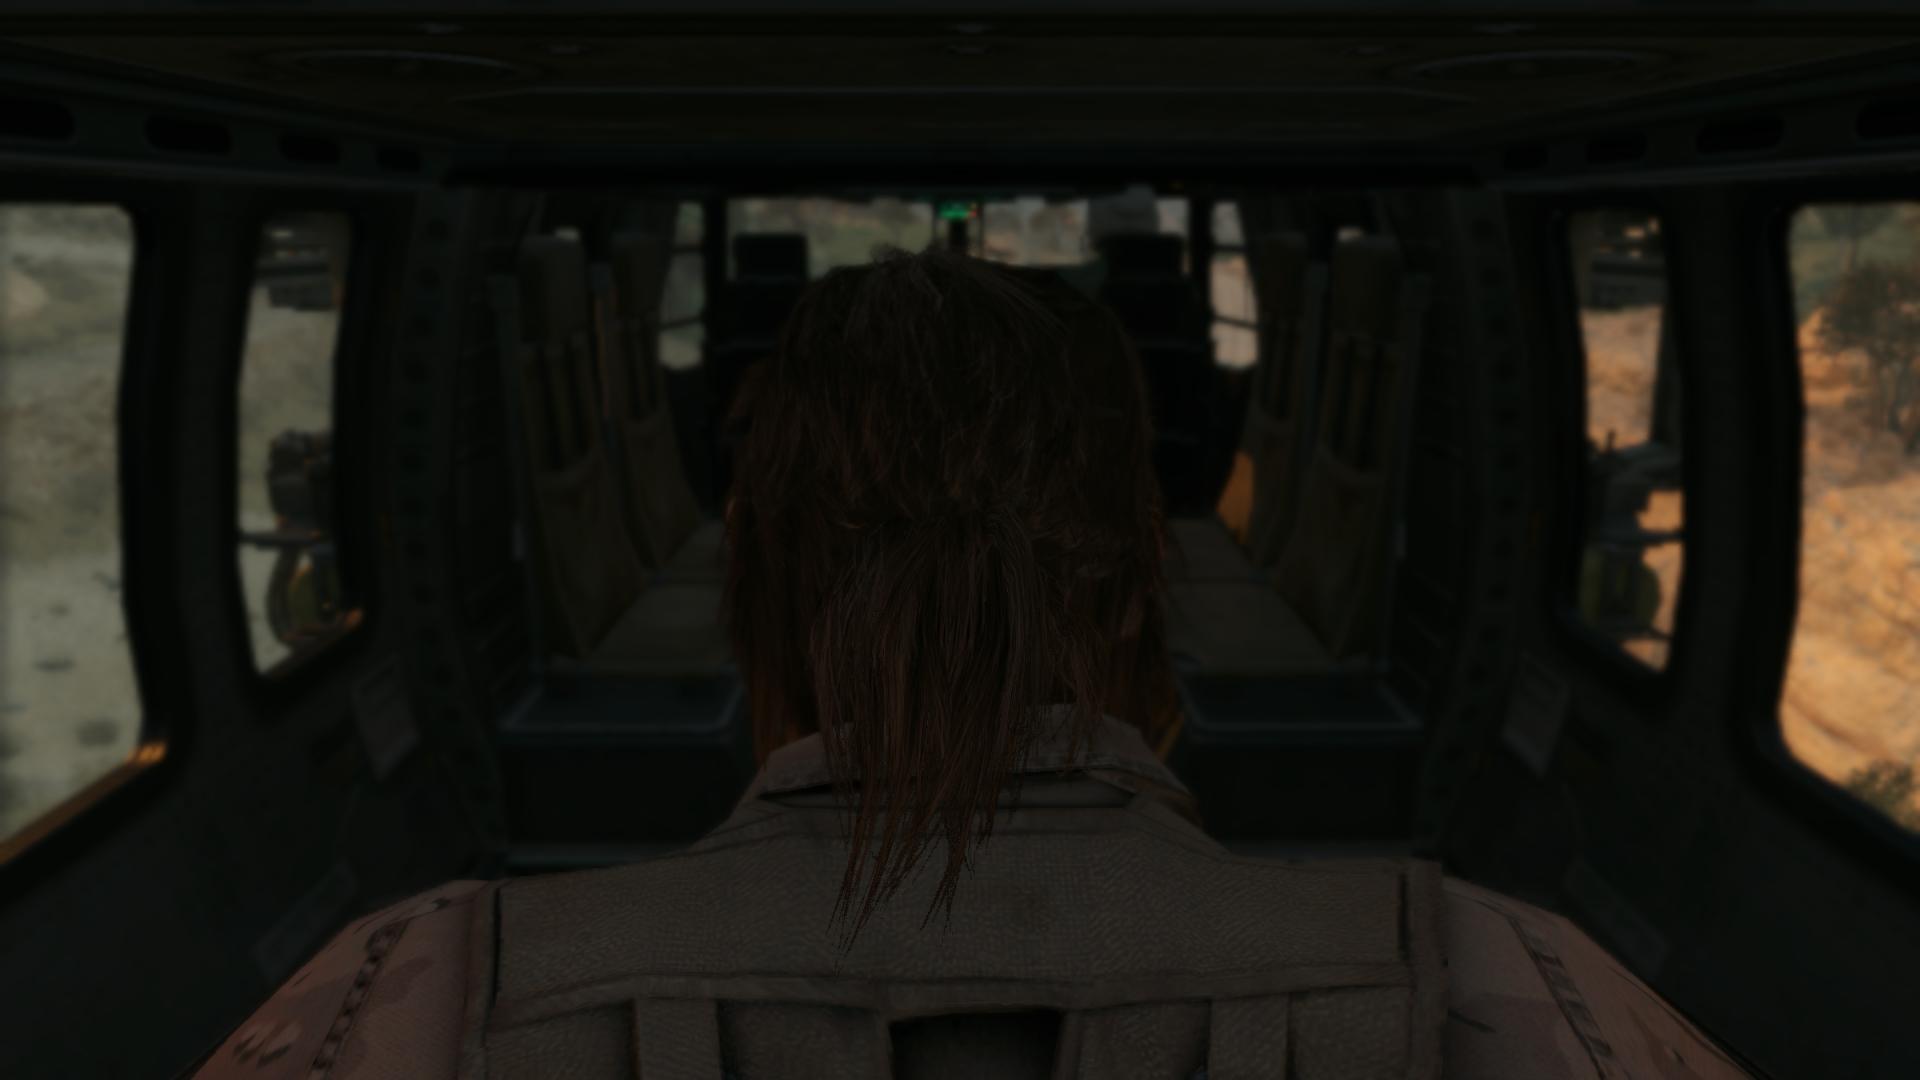 mgsvtpp_2017_07_21_01_46_38_556.png - Metal Gear Solid 5: The Phantom Pain